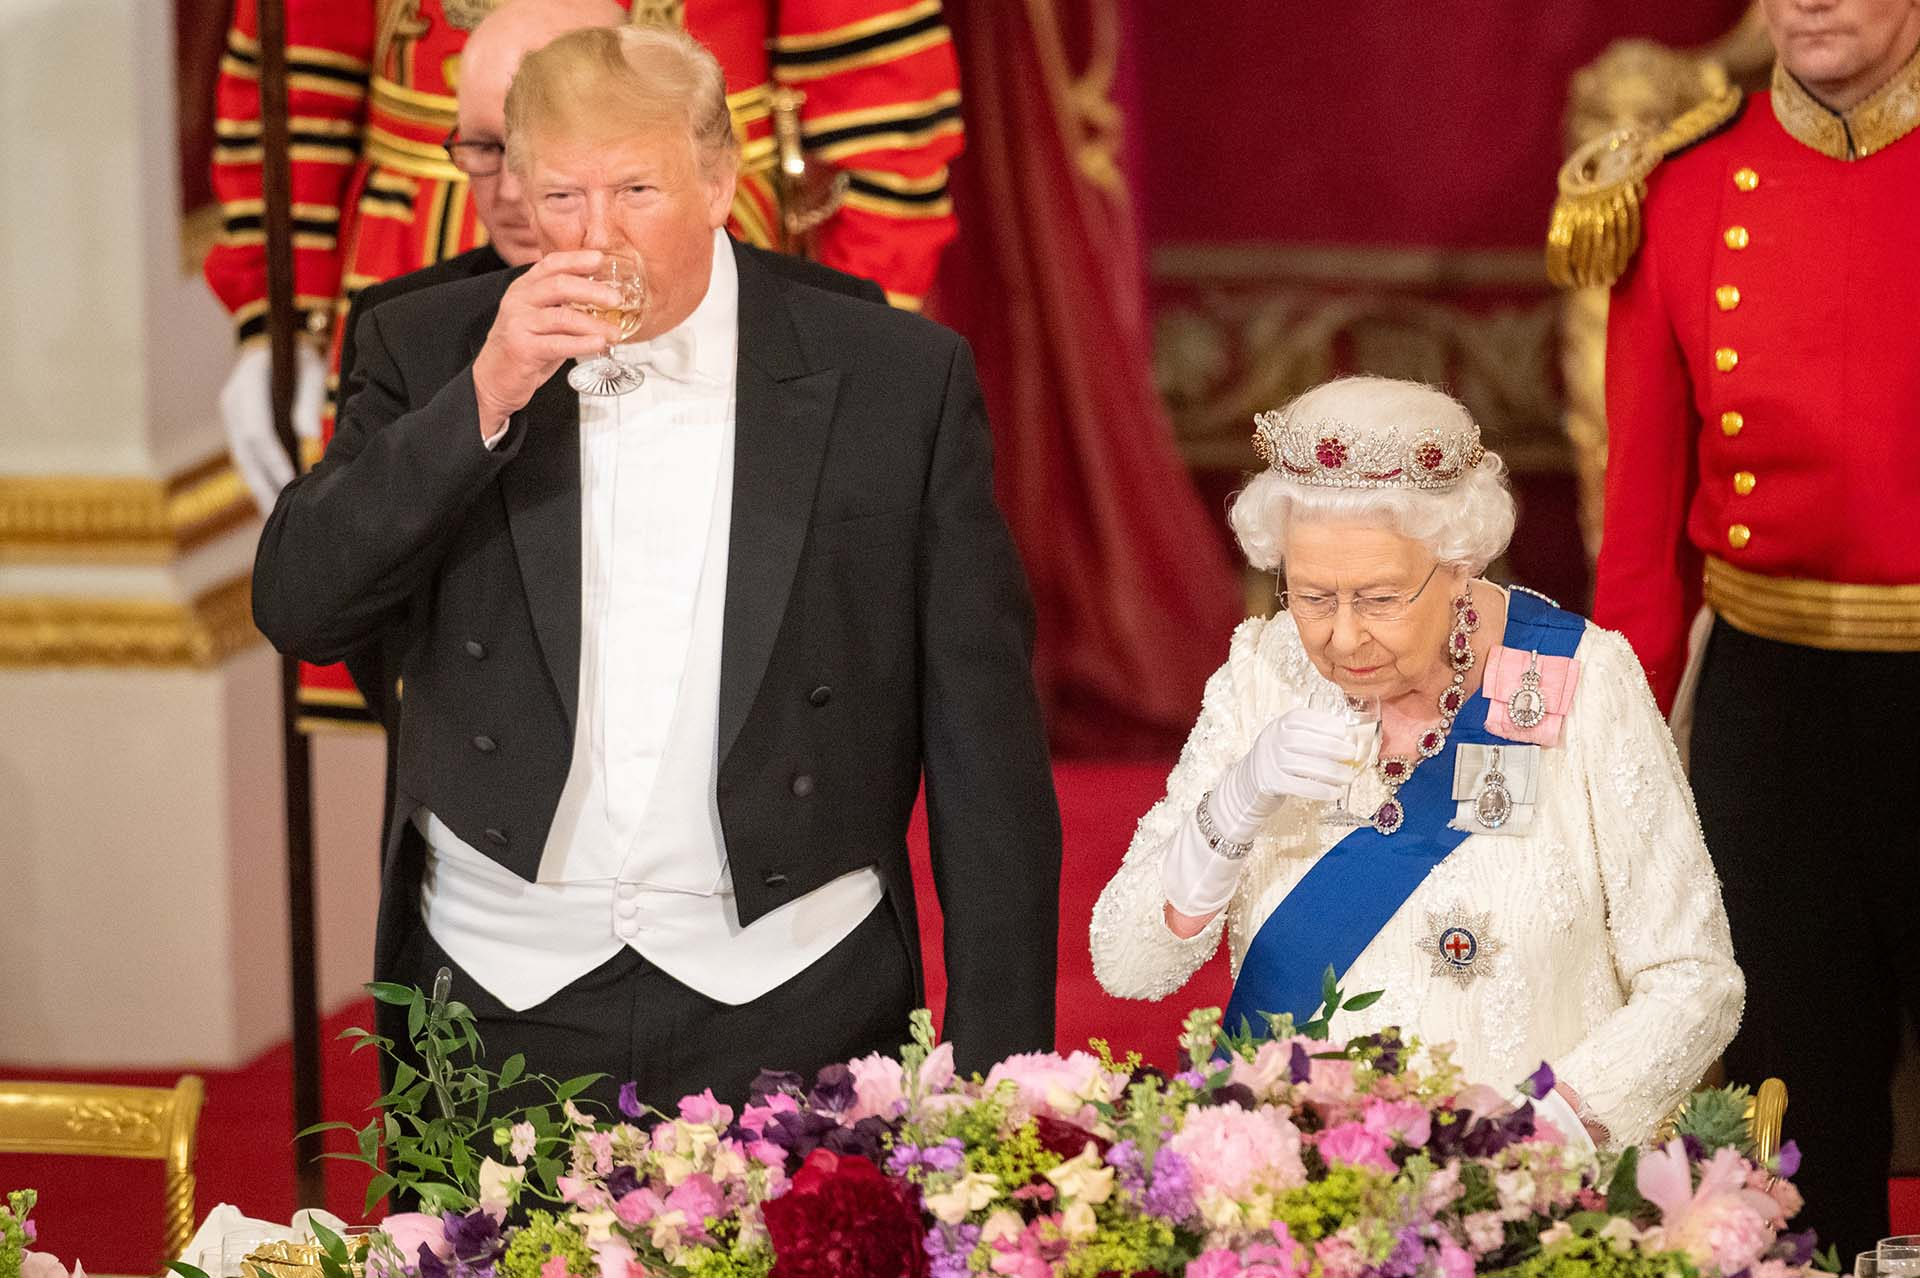 (Dominic Lipinski/ POOL/ AFP)